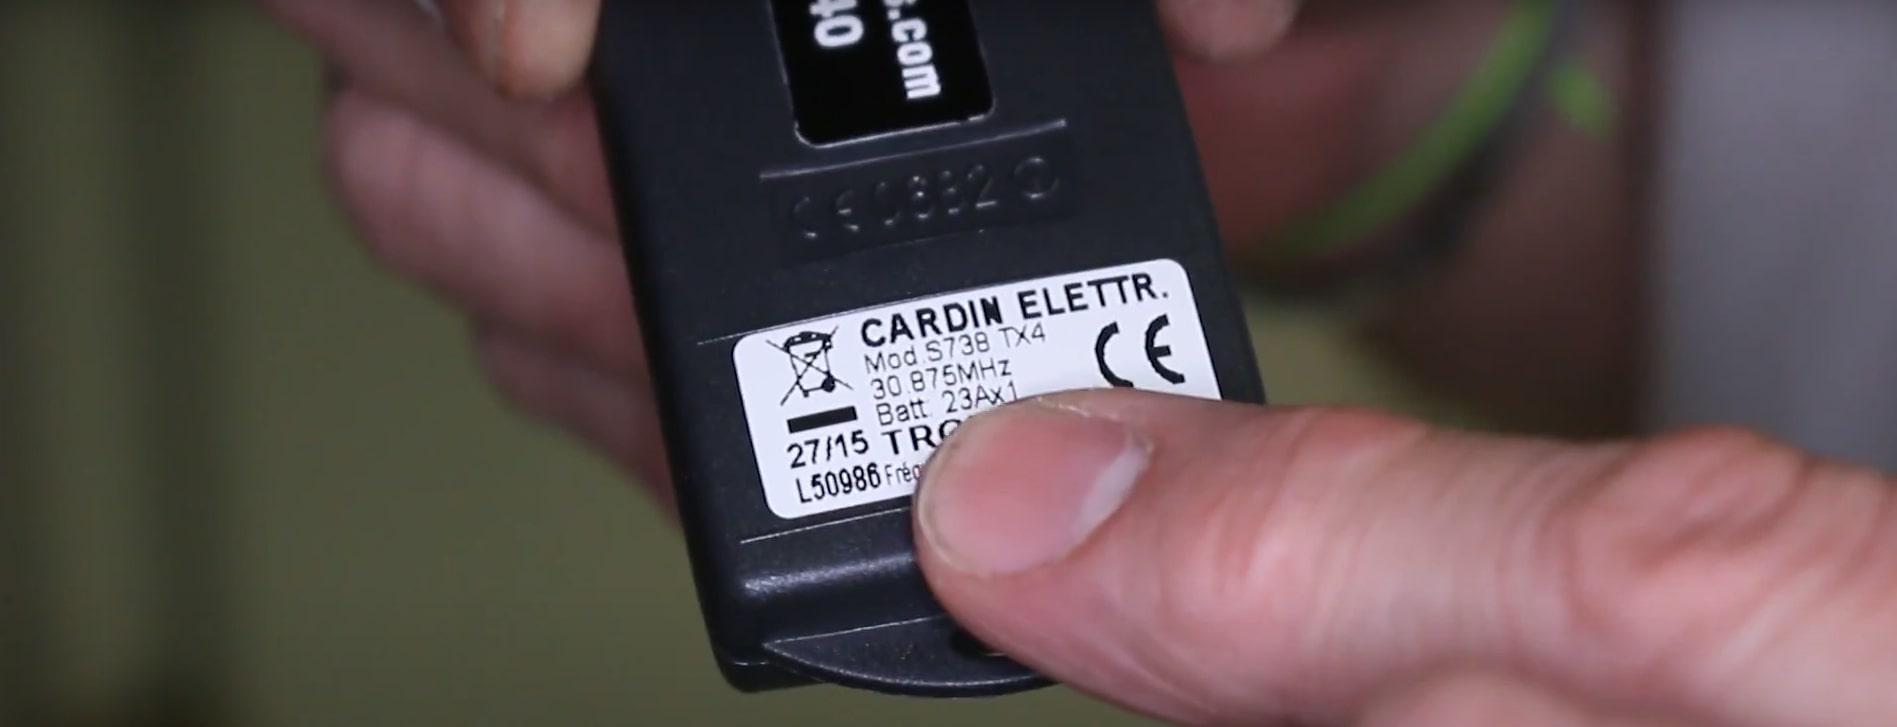 CARDIN S738 TX4